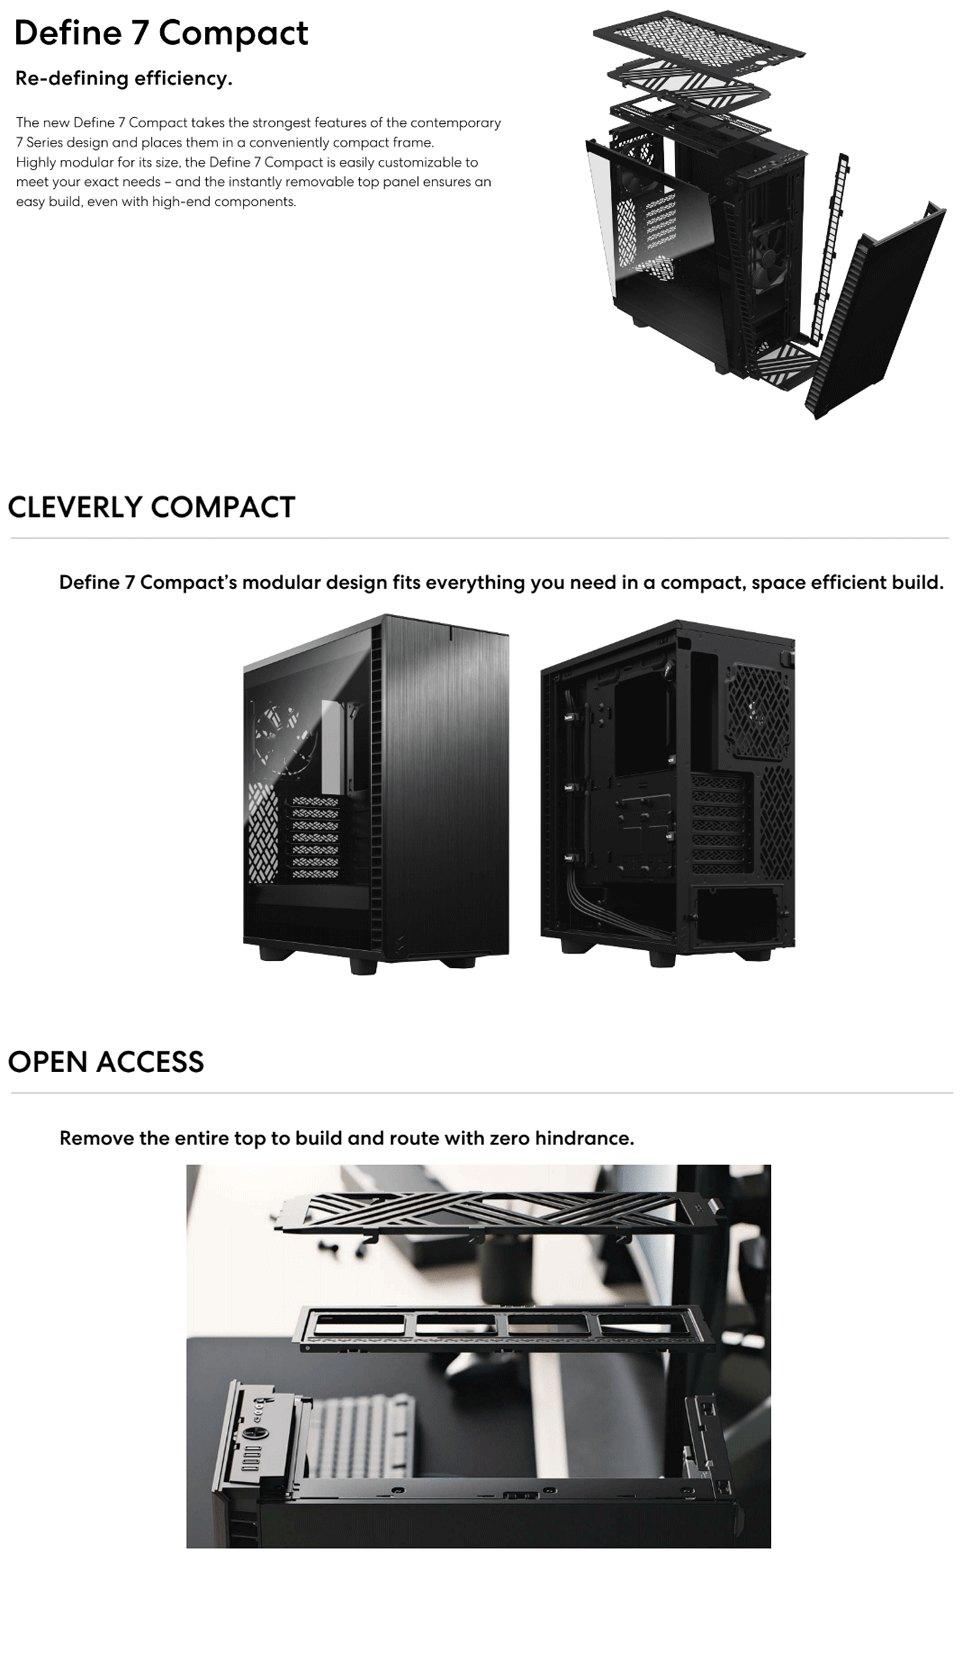 Fractal Design Define 7 Compact TG Dark Tint features